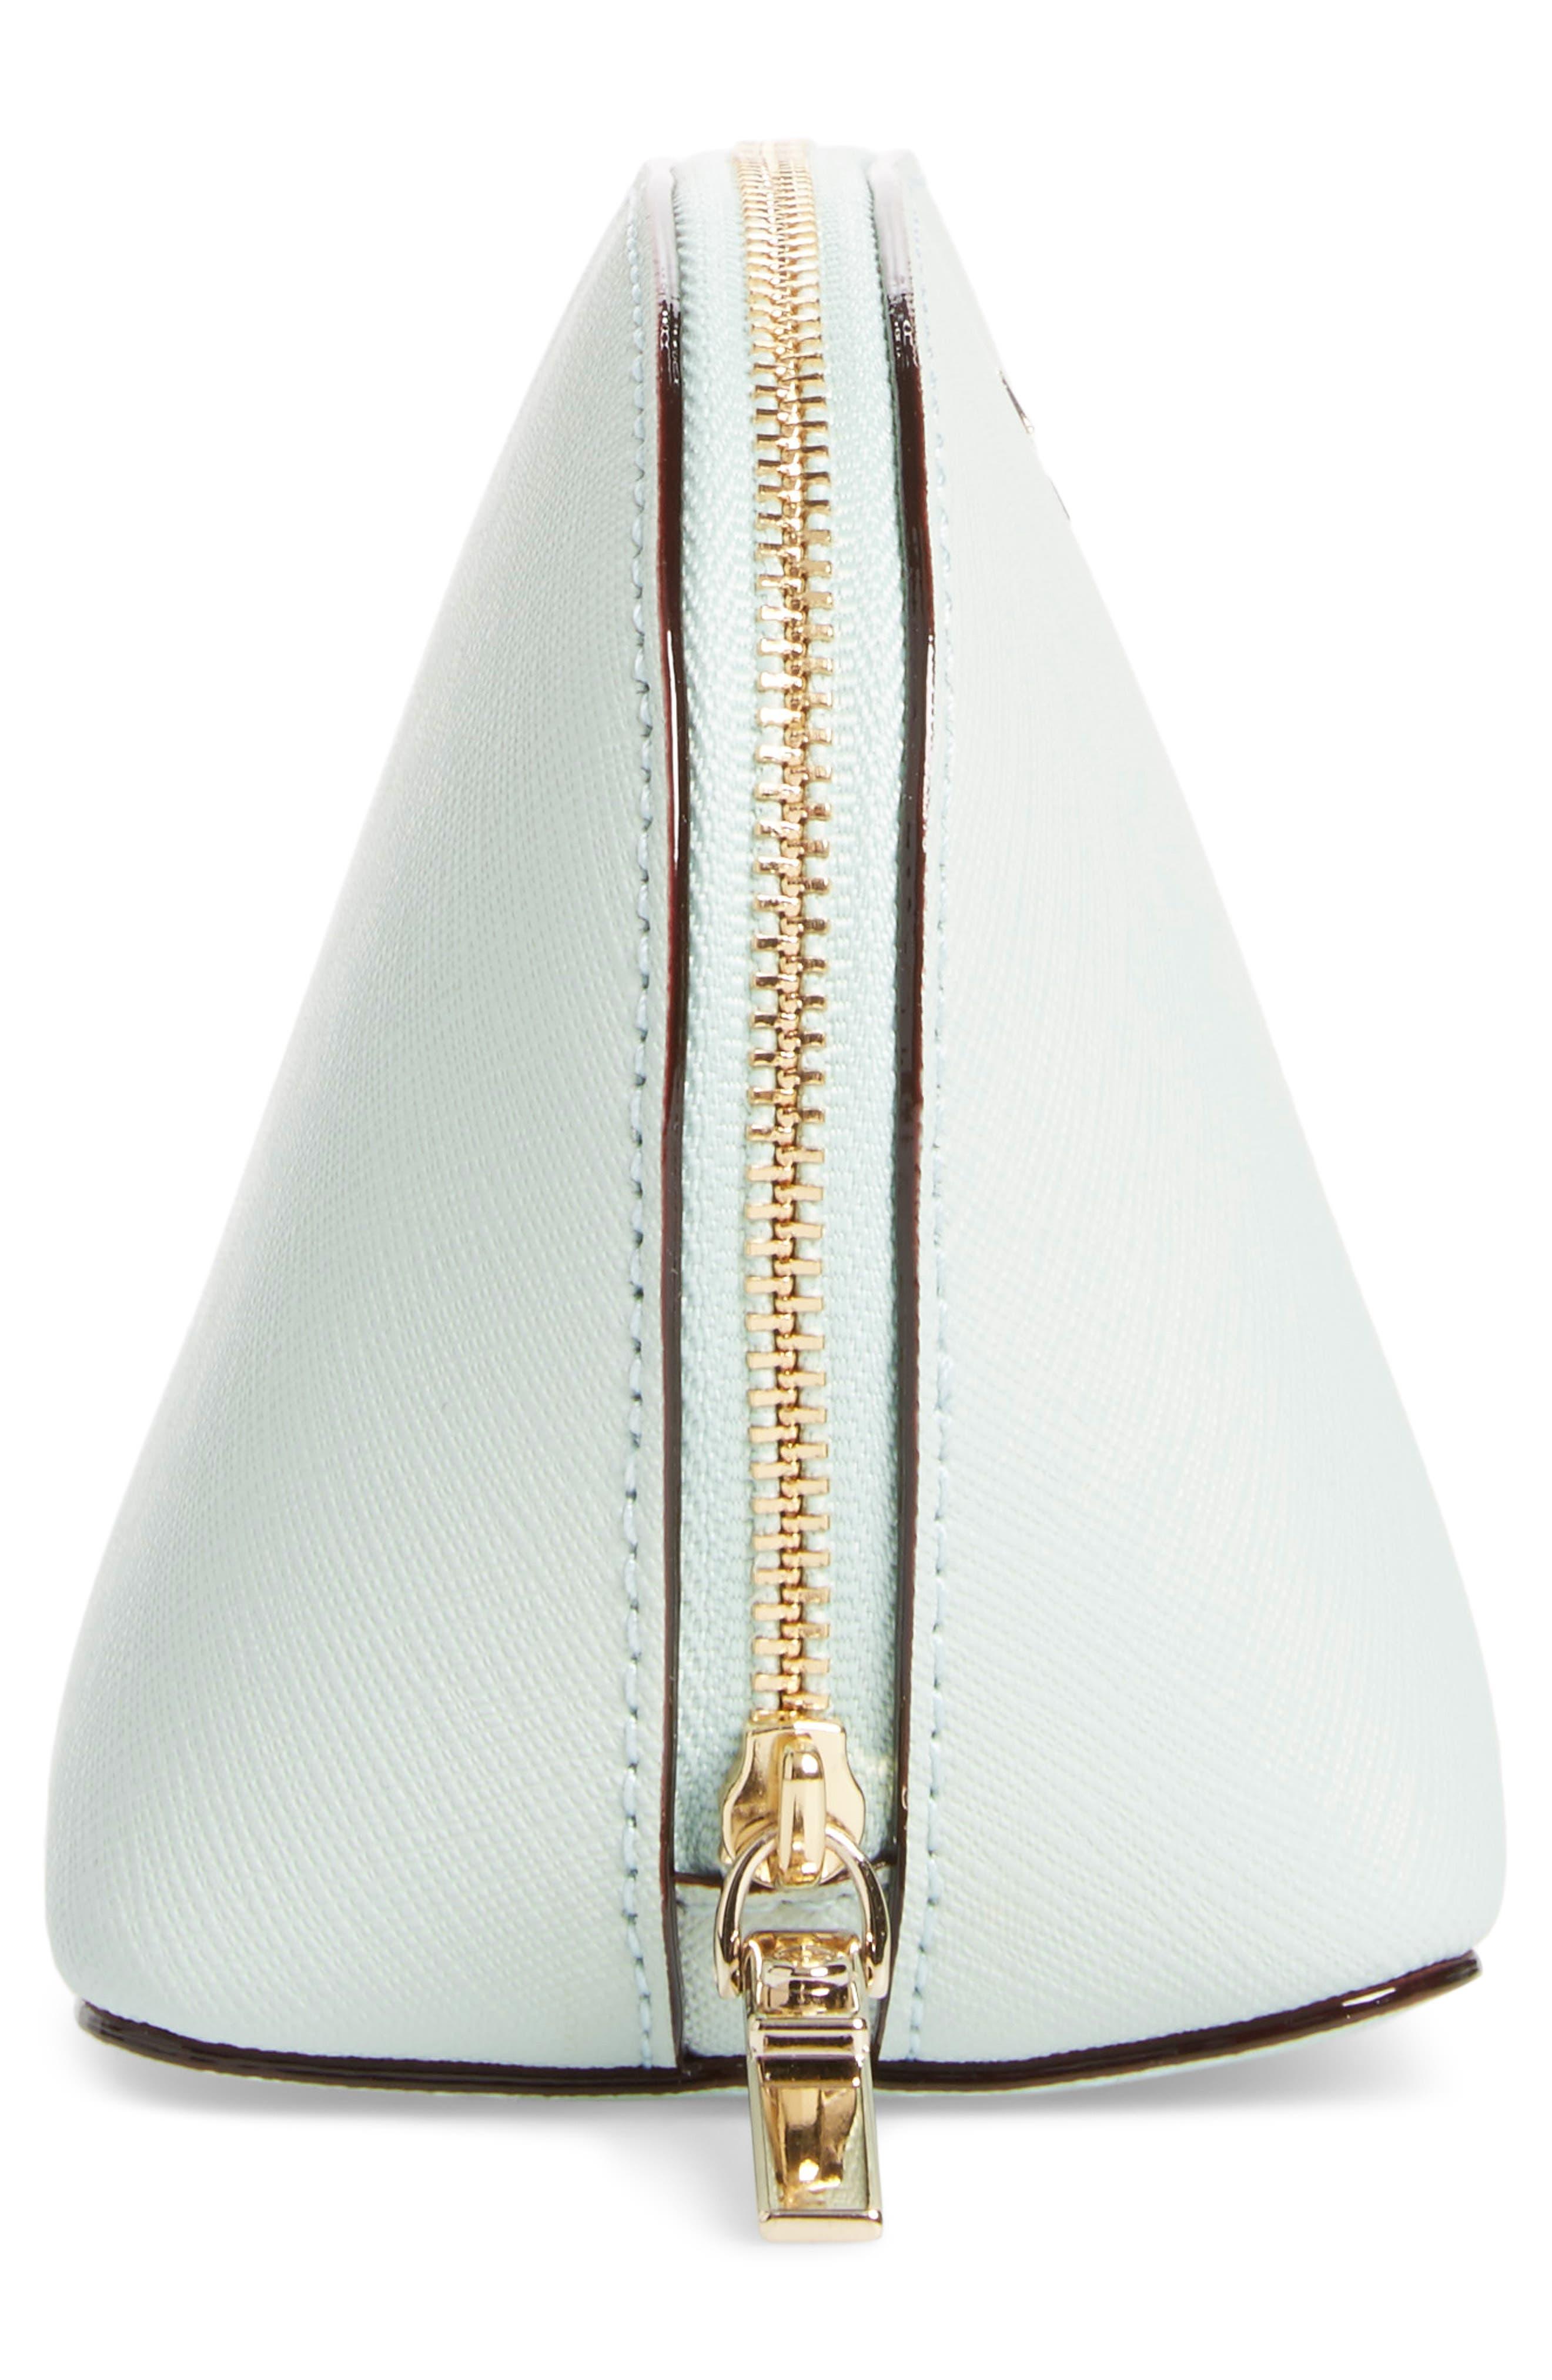 cameron street - small abalene leather cosmetics bag,                             Alternate thumbnail 4, color,                             302